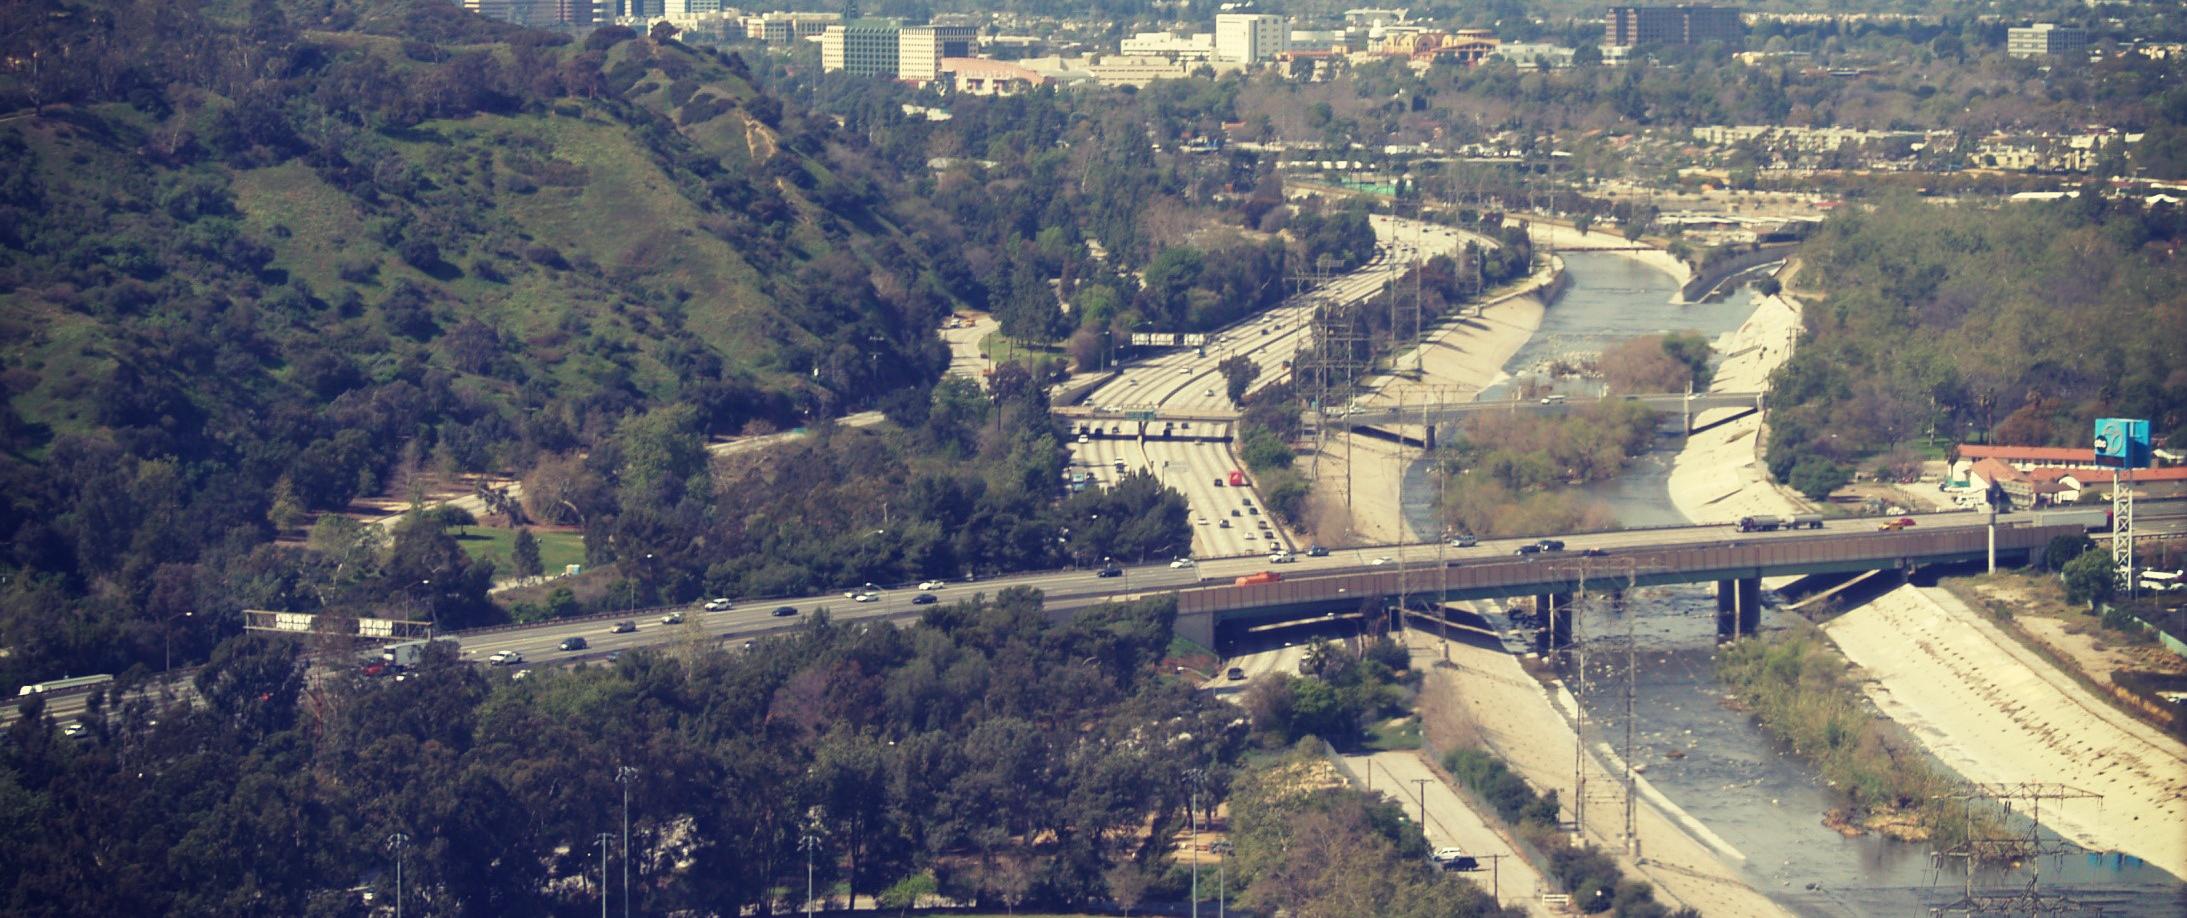 LA River: Revitalization for Stronger Communities